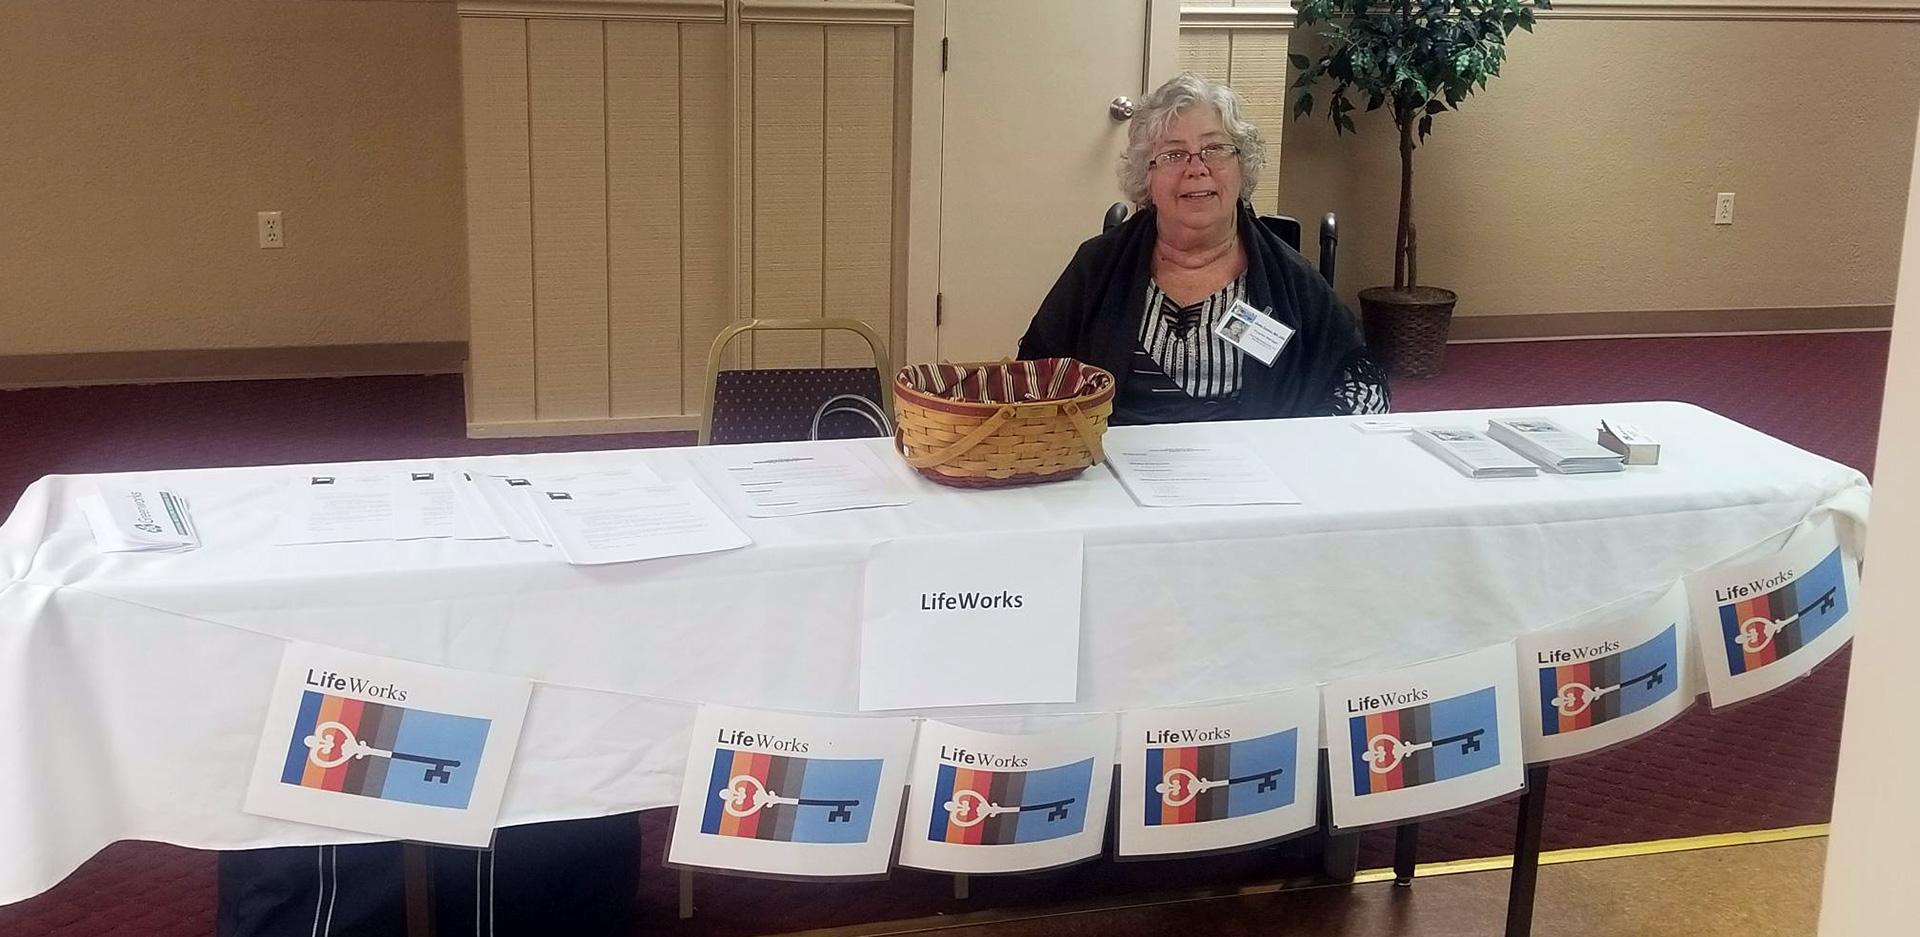 LifeWorks GBR County Job Fair, Cindy Tucker